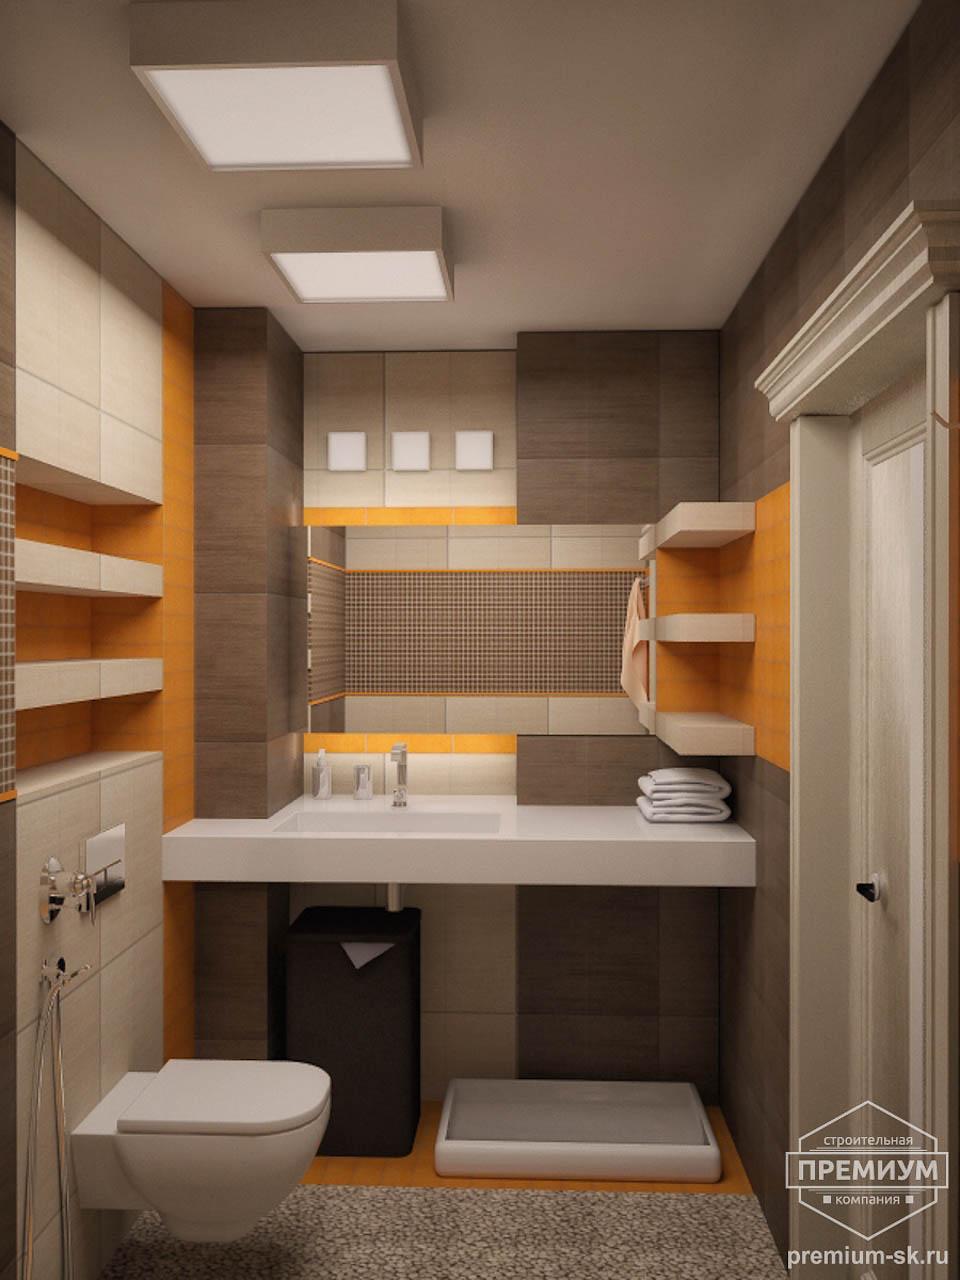 Дизайн интерьера однокомнатной квартиры по ул. Сыромолотова 11 img1327754484